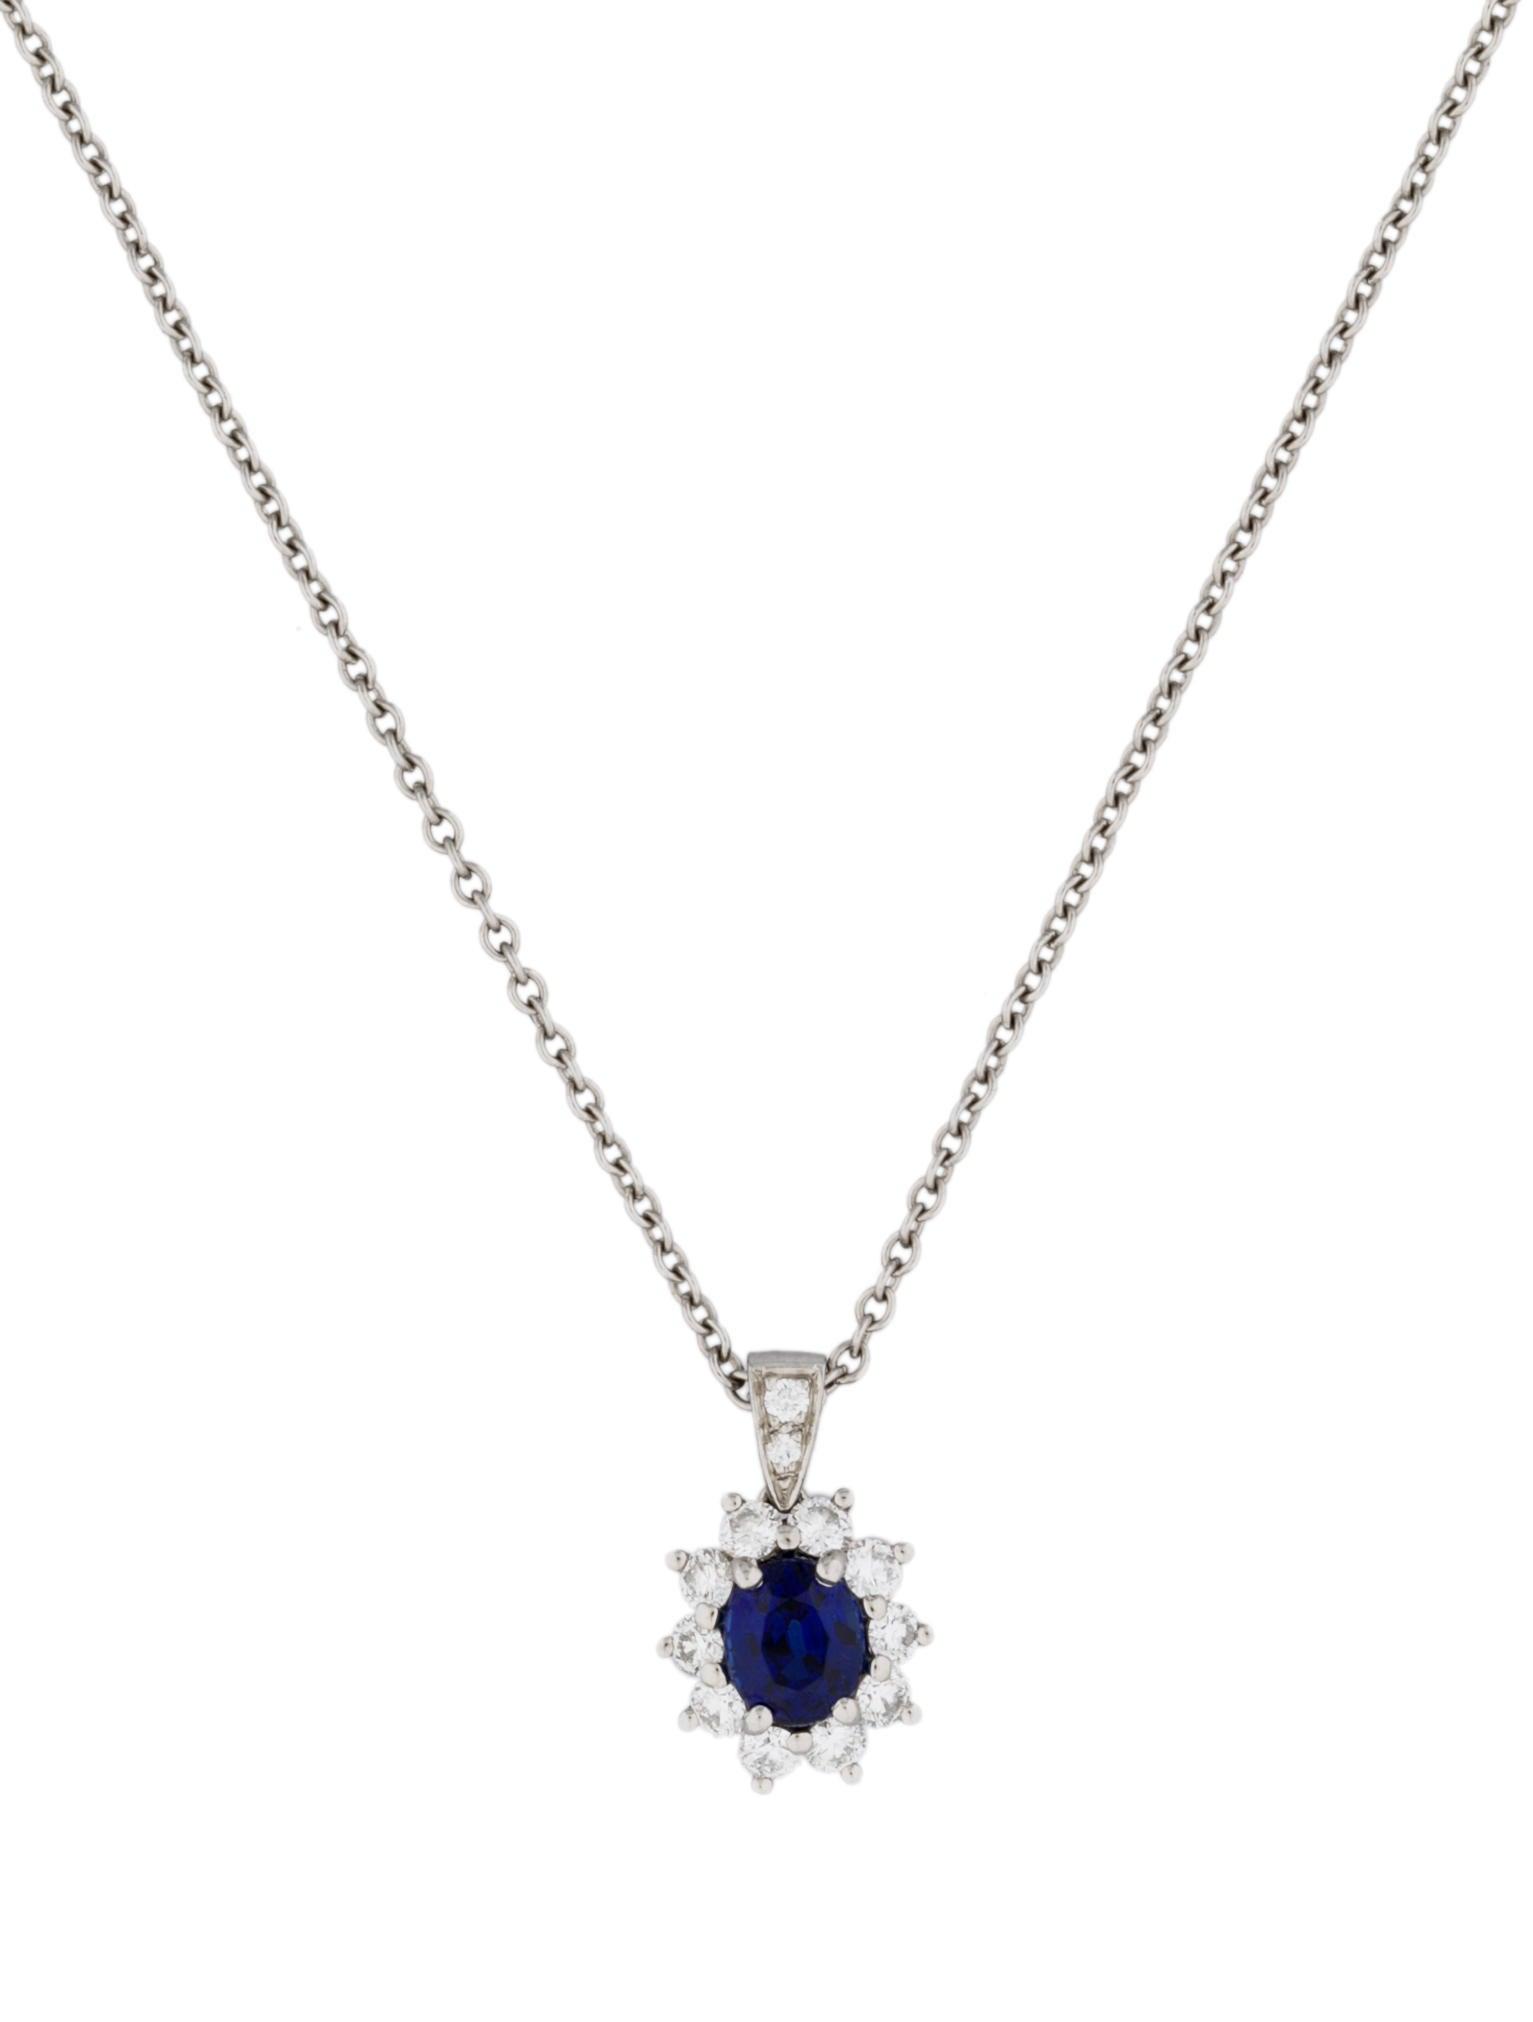 Tiffany & Co 1 17ct Sapphire & Diamond Halo Pendant Necklaces